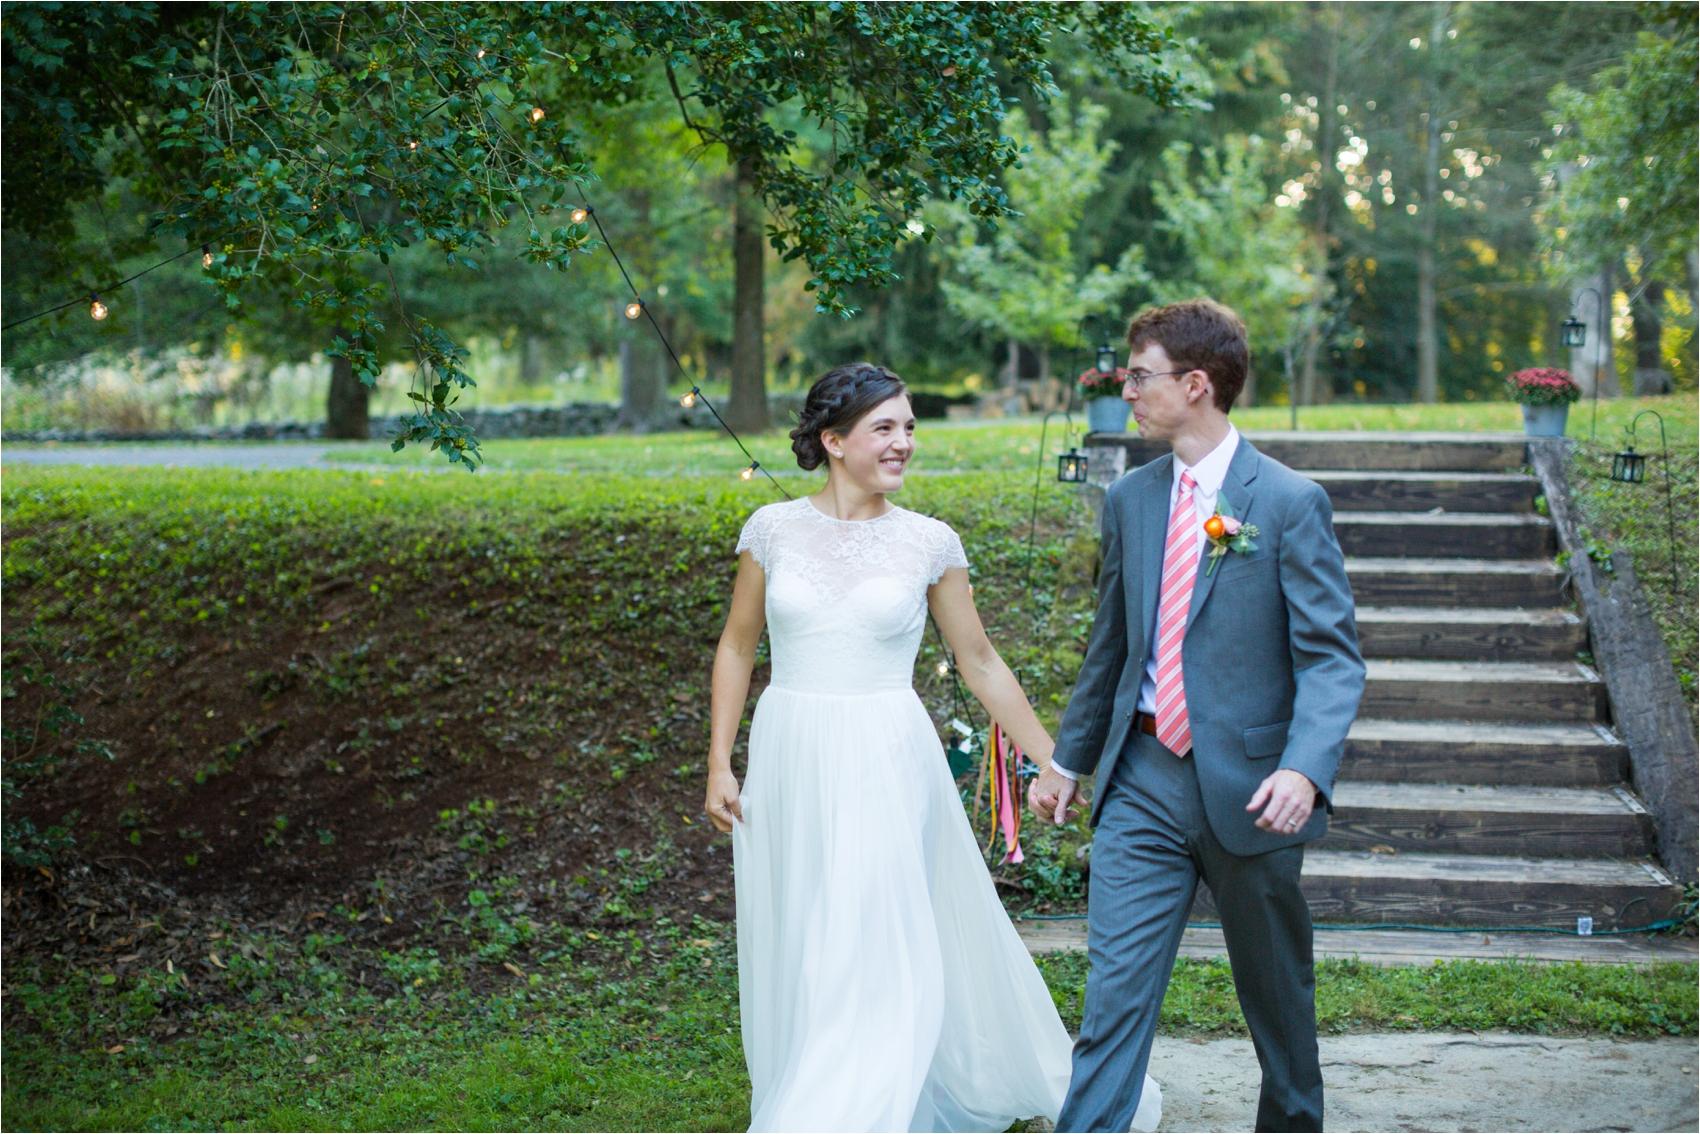 Feather-and-Oak-Rainforest-Trust-Virginia-Wedding-0939.jpg